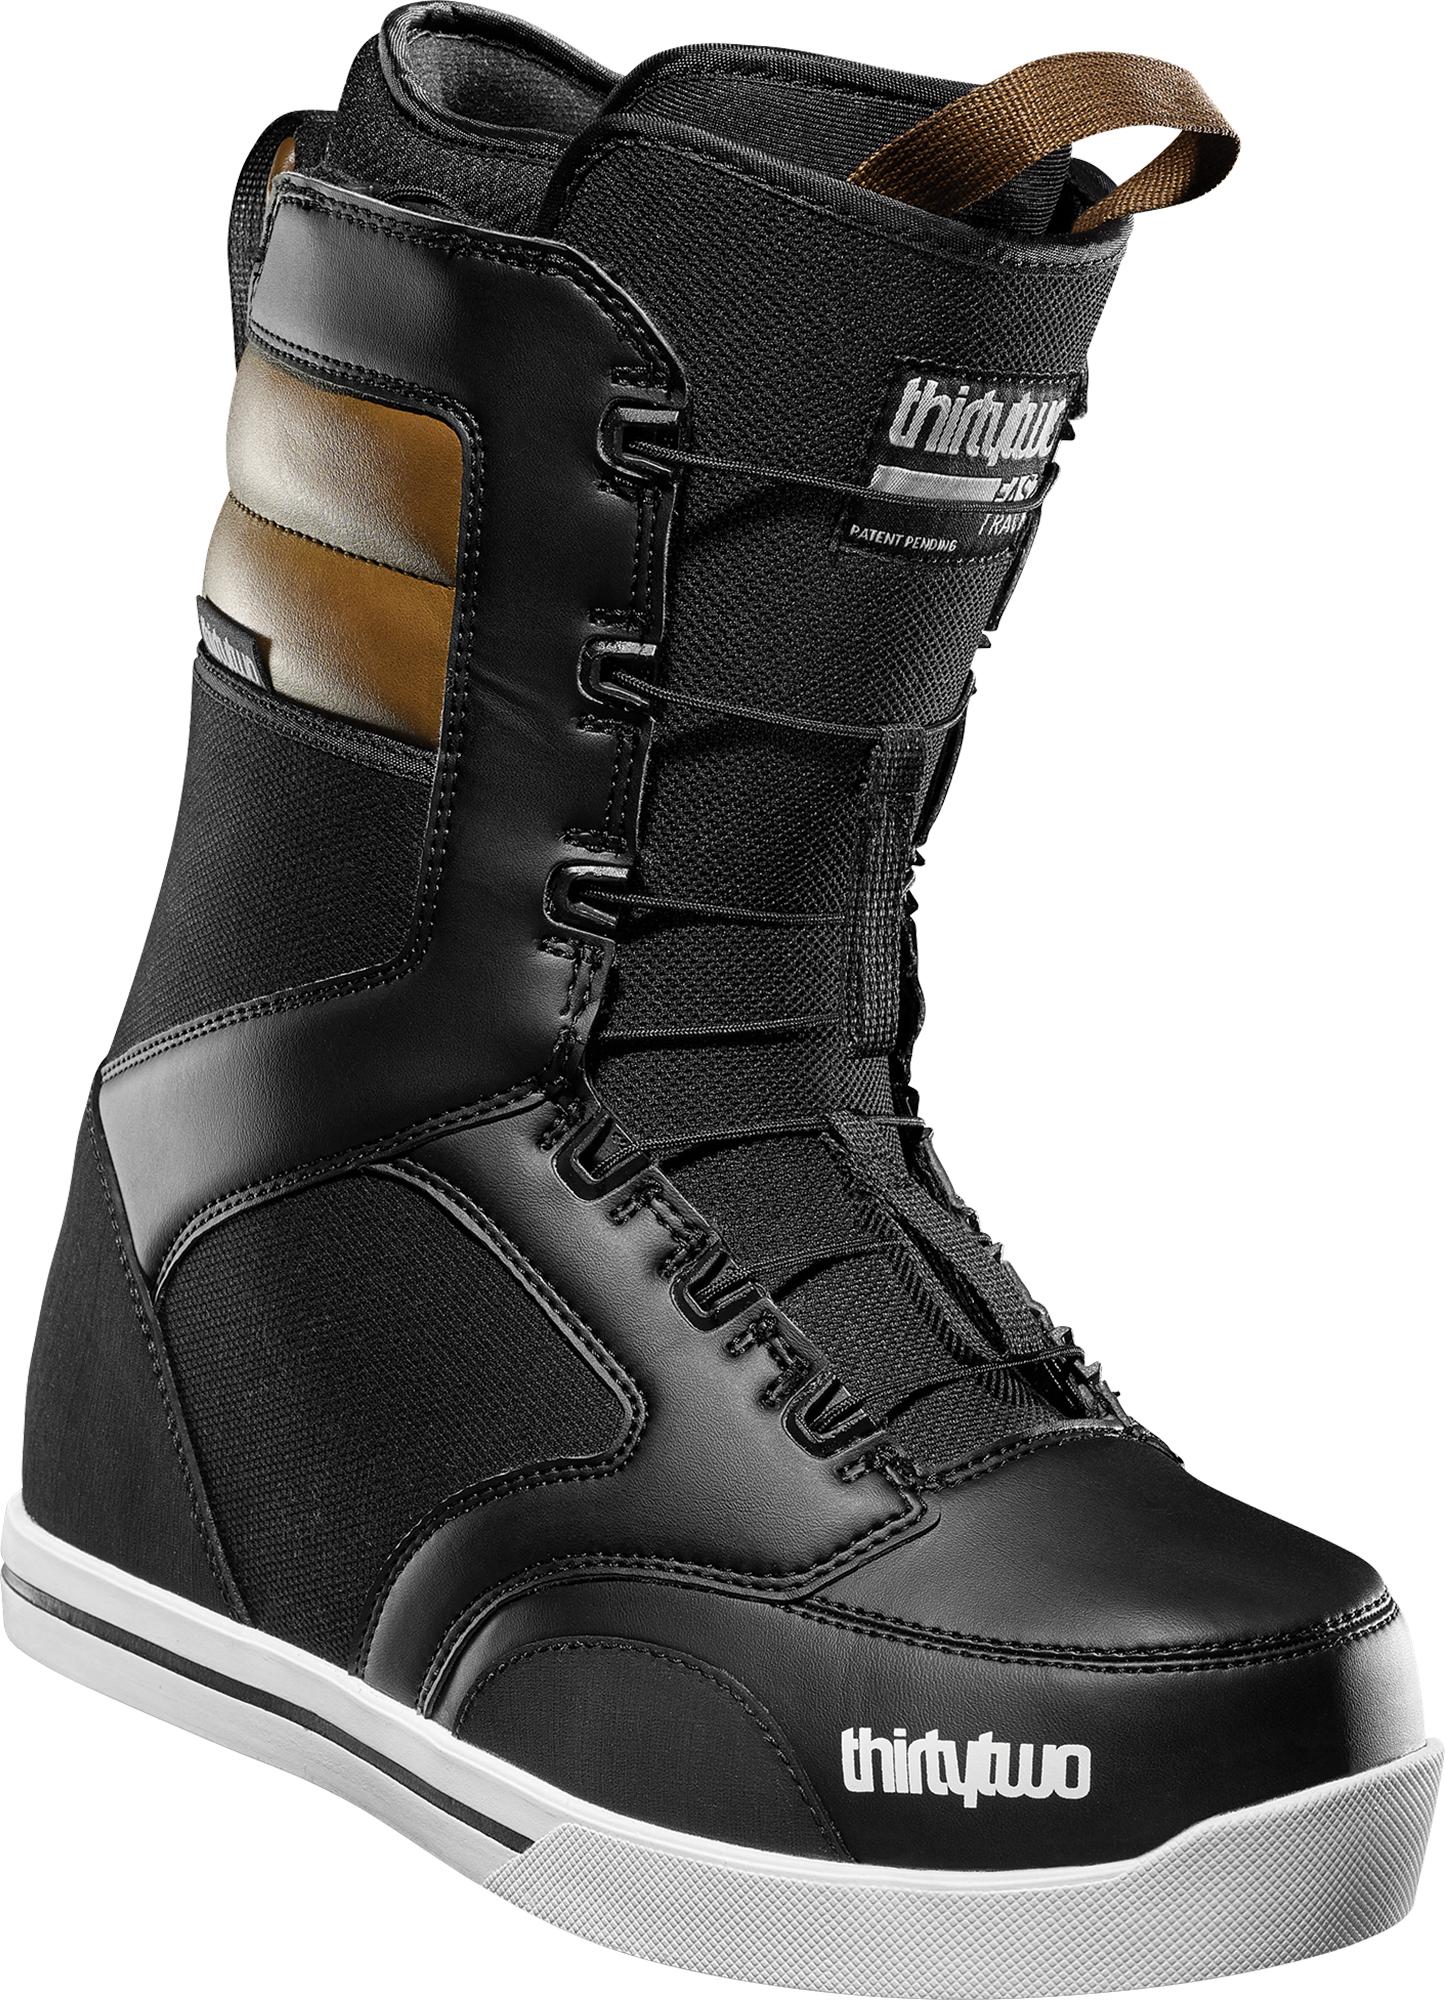 ThirtyTwo Сноубордические ботинки ThirtyTwo 86 Ft '18, размер 44 сноубордические ботинки black fire scoop 16 17 размер 41